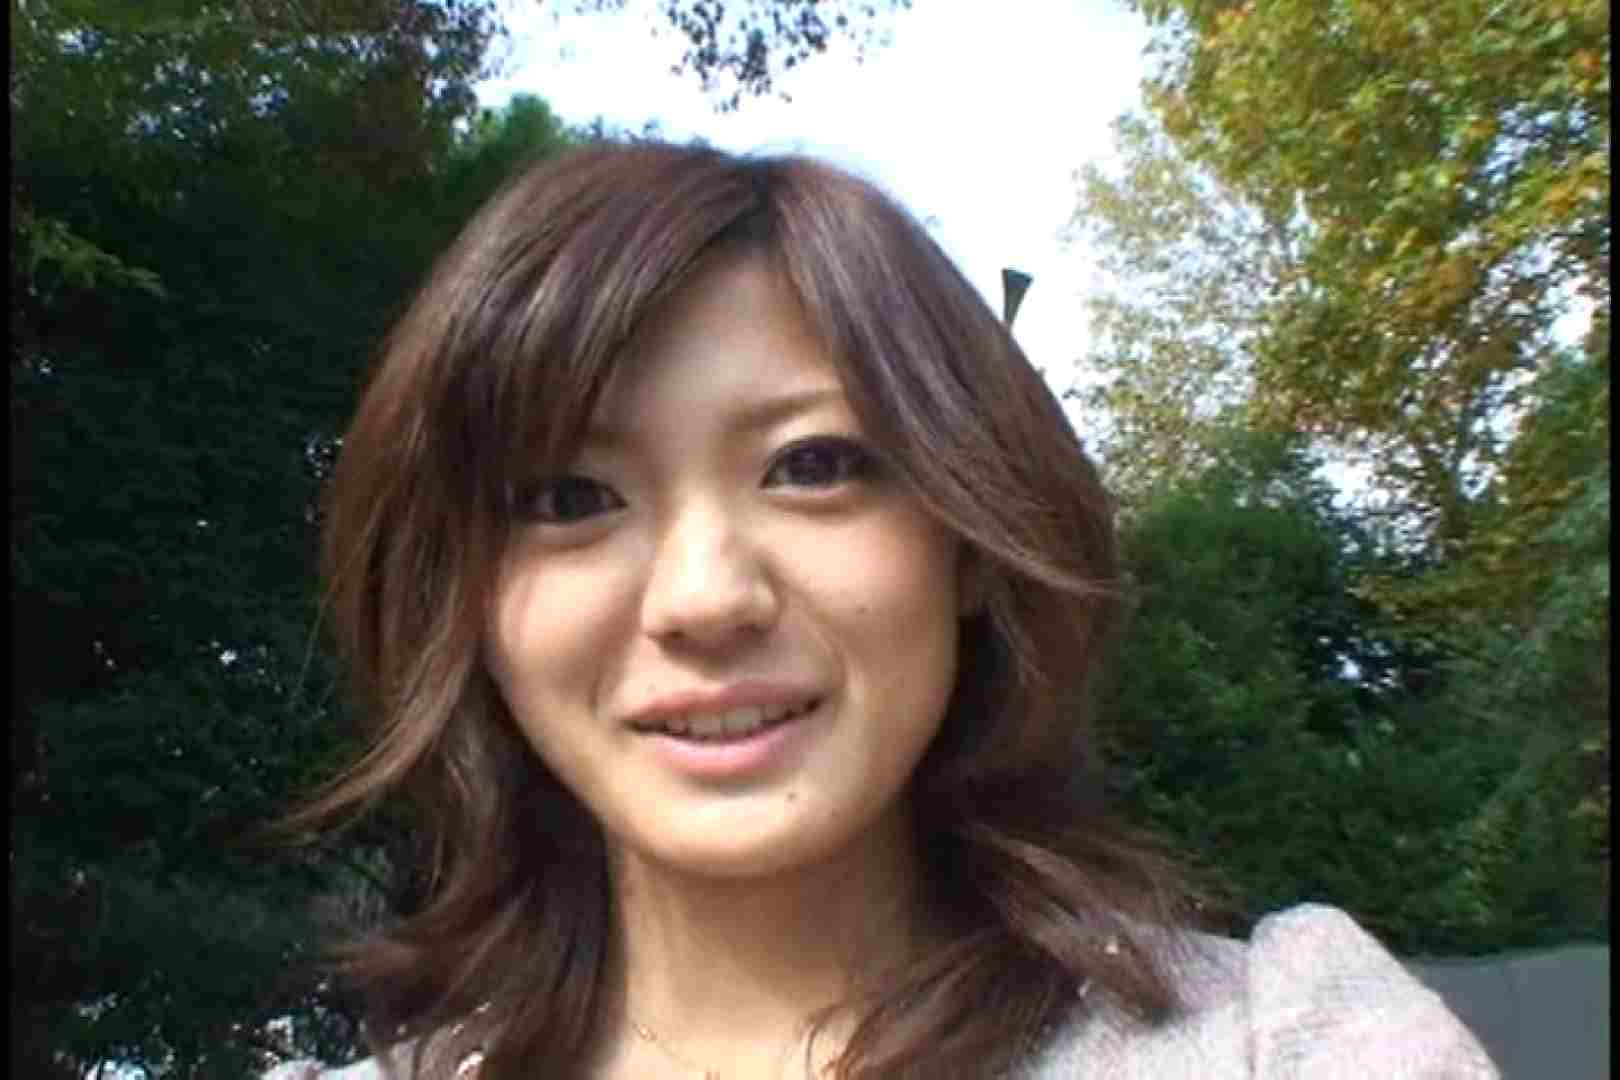 JDハンター全国ツアー vol.035 前編 女子大生のエロ動画 | 0  110PIX 29